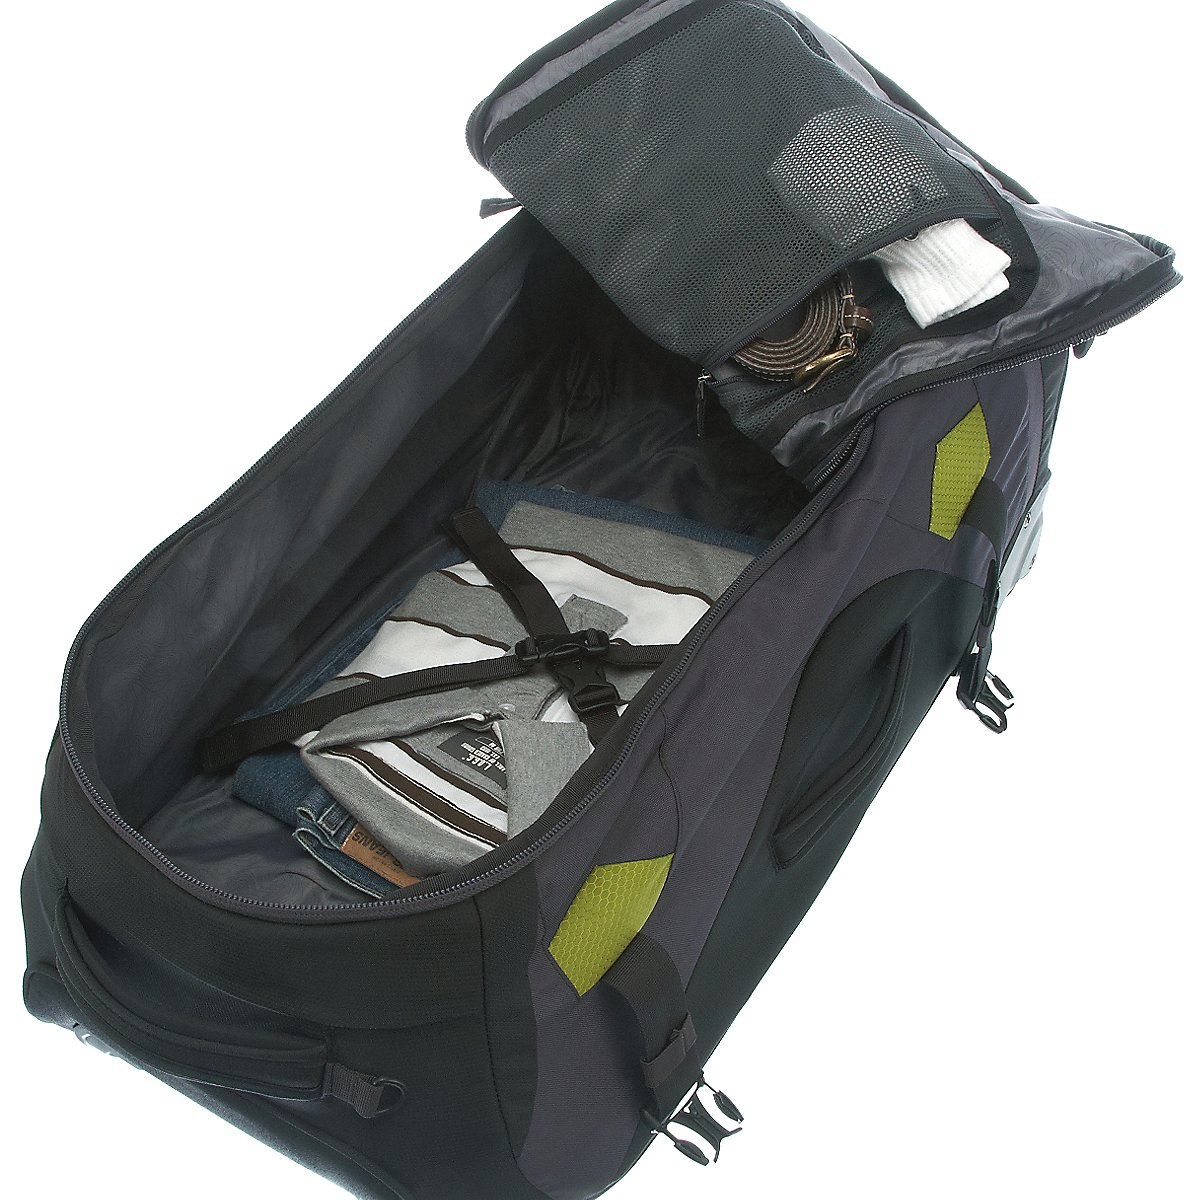 deuter travel helion 80 rucksack auf rollen 75 cm koffer. Black Bedroom Furniture Sets. Home Design Ideas